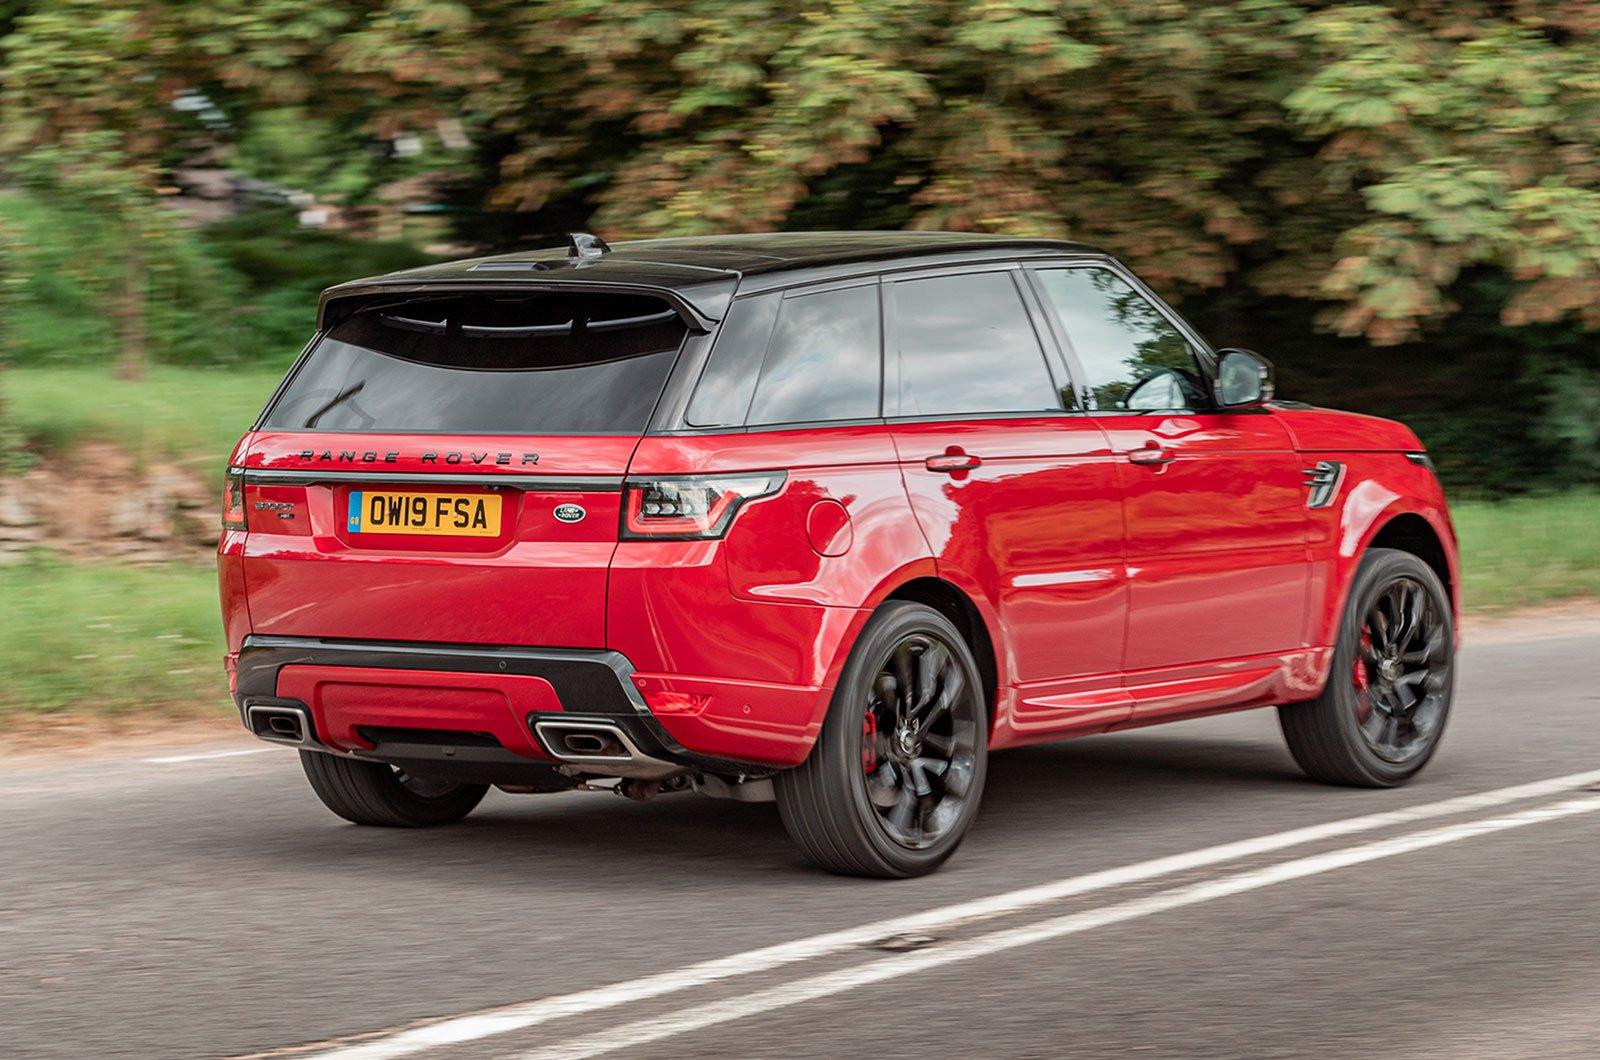 2019 Range Rover Sport driving